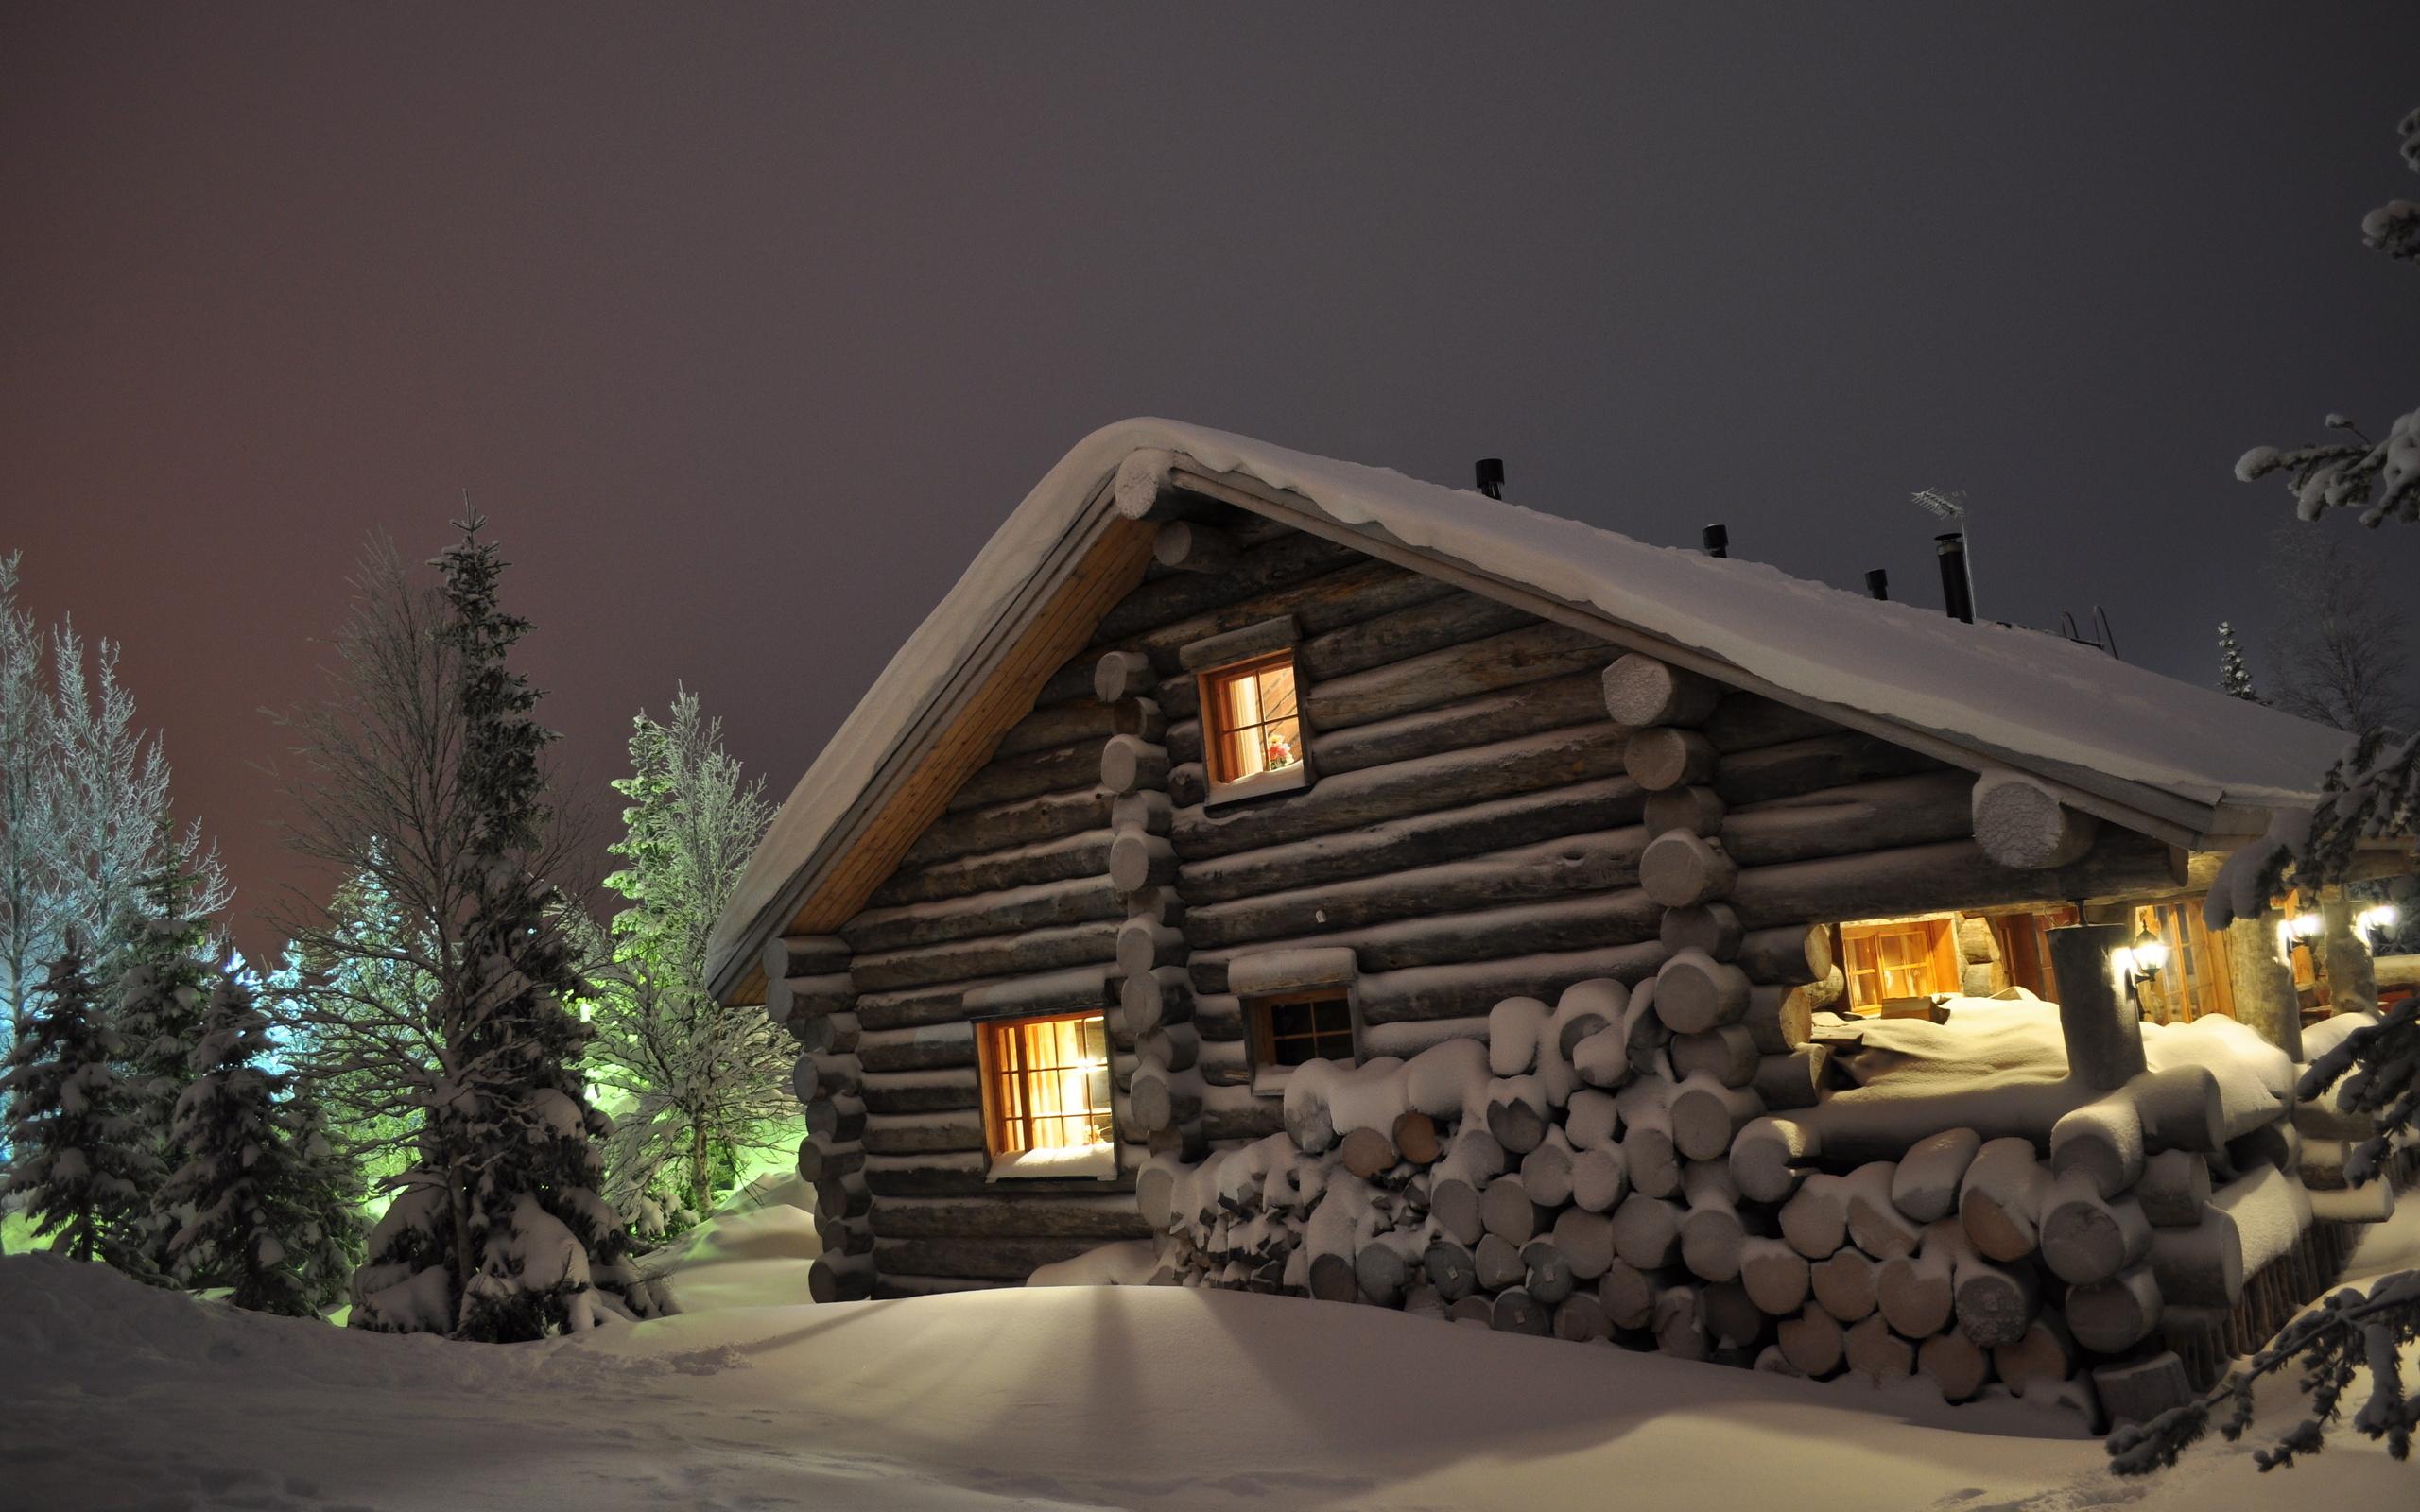 Download Wallpaper winter snow drifts log cabin wood night eating 2560x1600